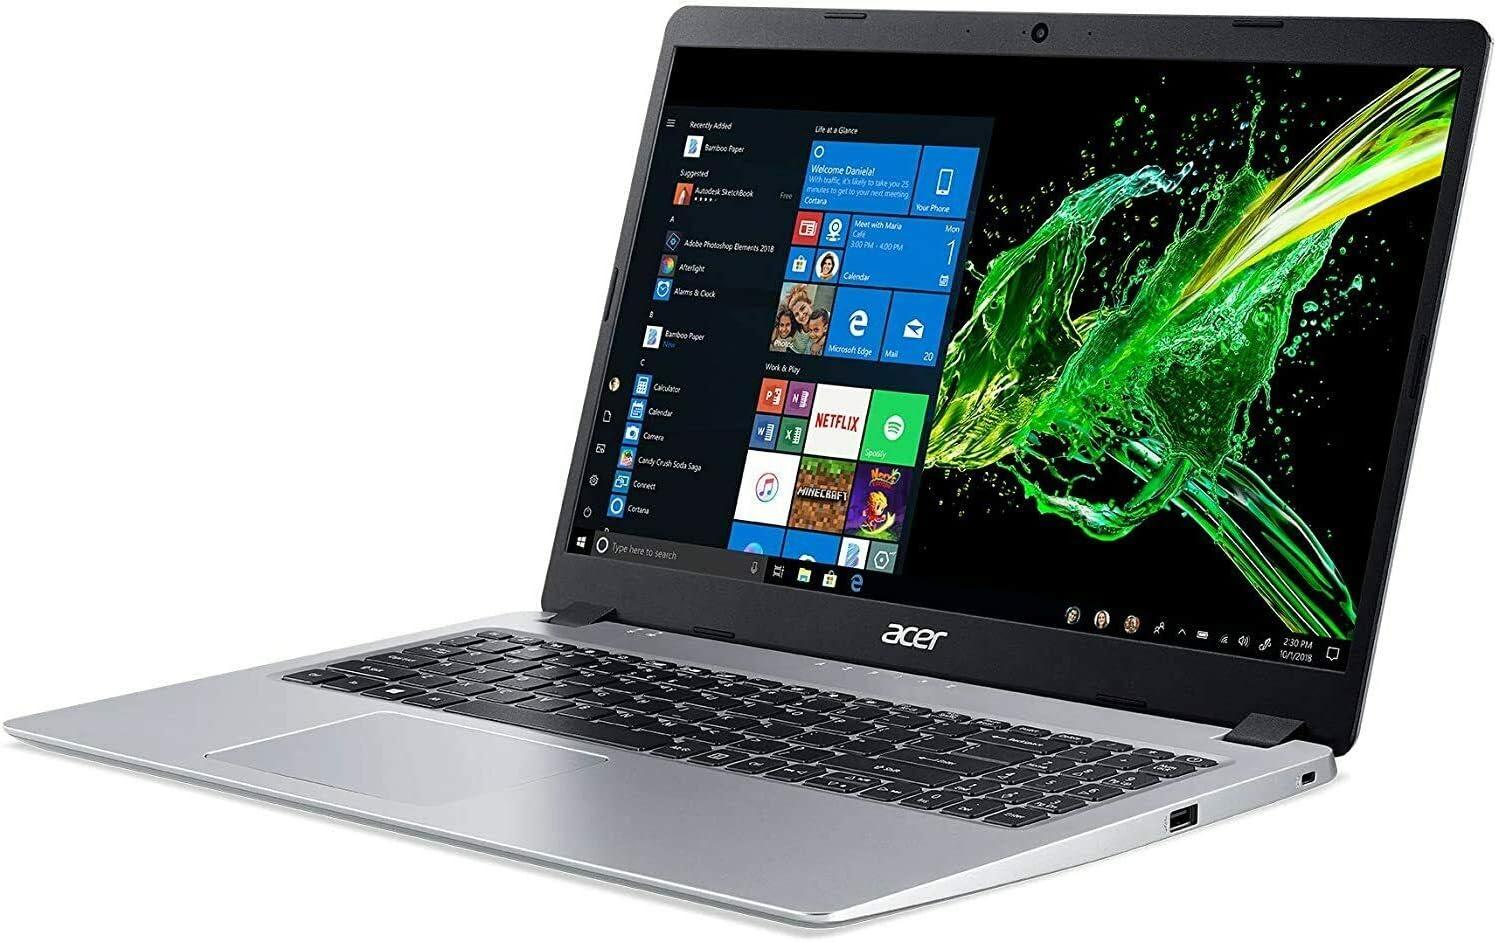 Acer Aspire 5 Slim Laptop, 15.6